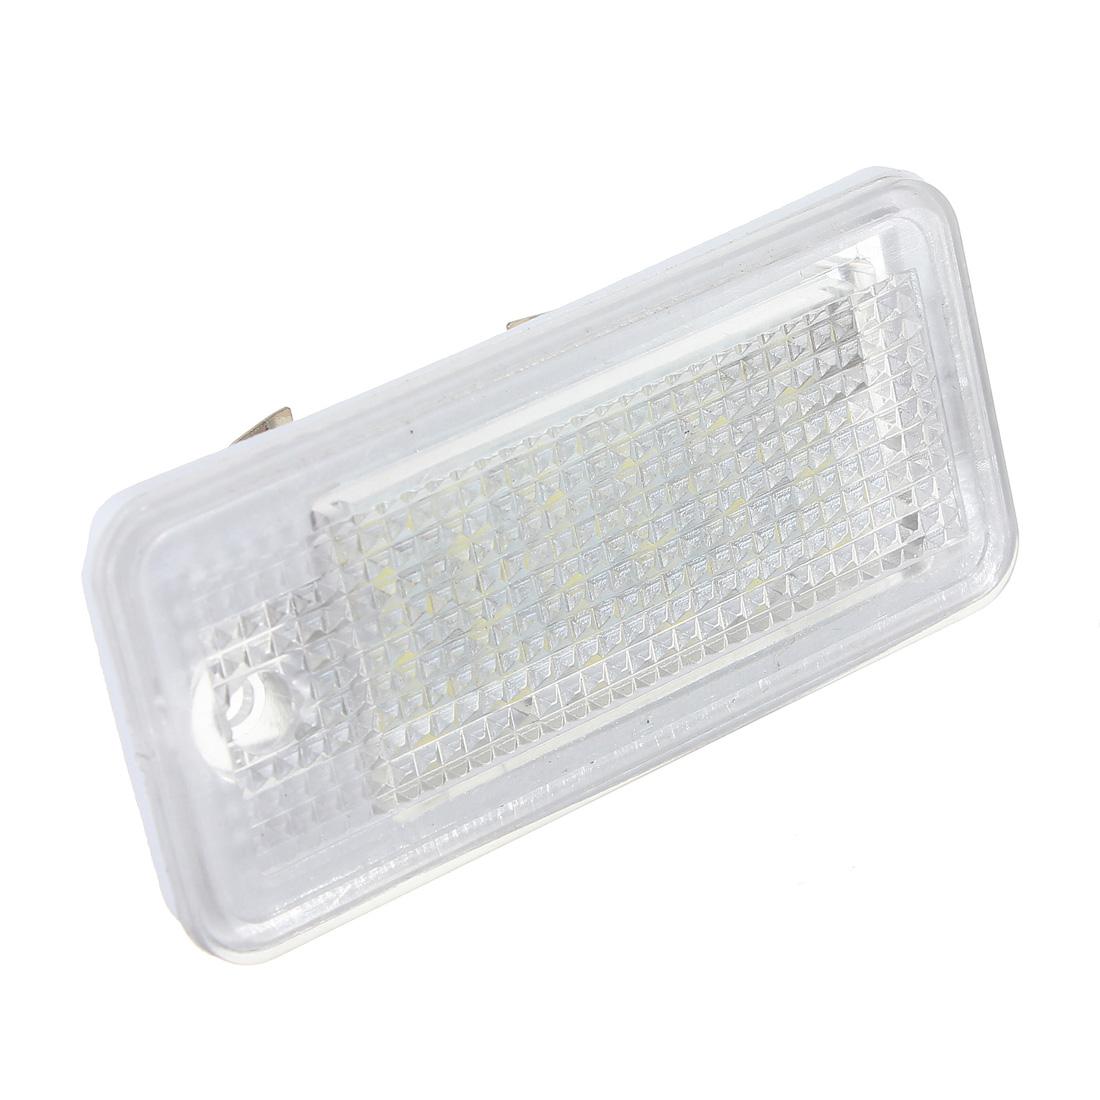 2x 18 SMD LED Lampade Luci Luce Targa Bianco Audi A3 A4 S4 A6 RS6 A8 Q7 Quattro   eBay -> Lampade A Led Rs